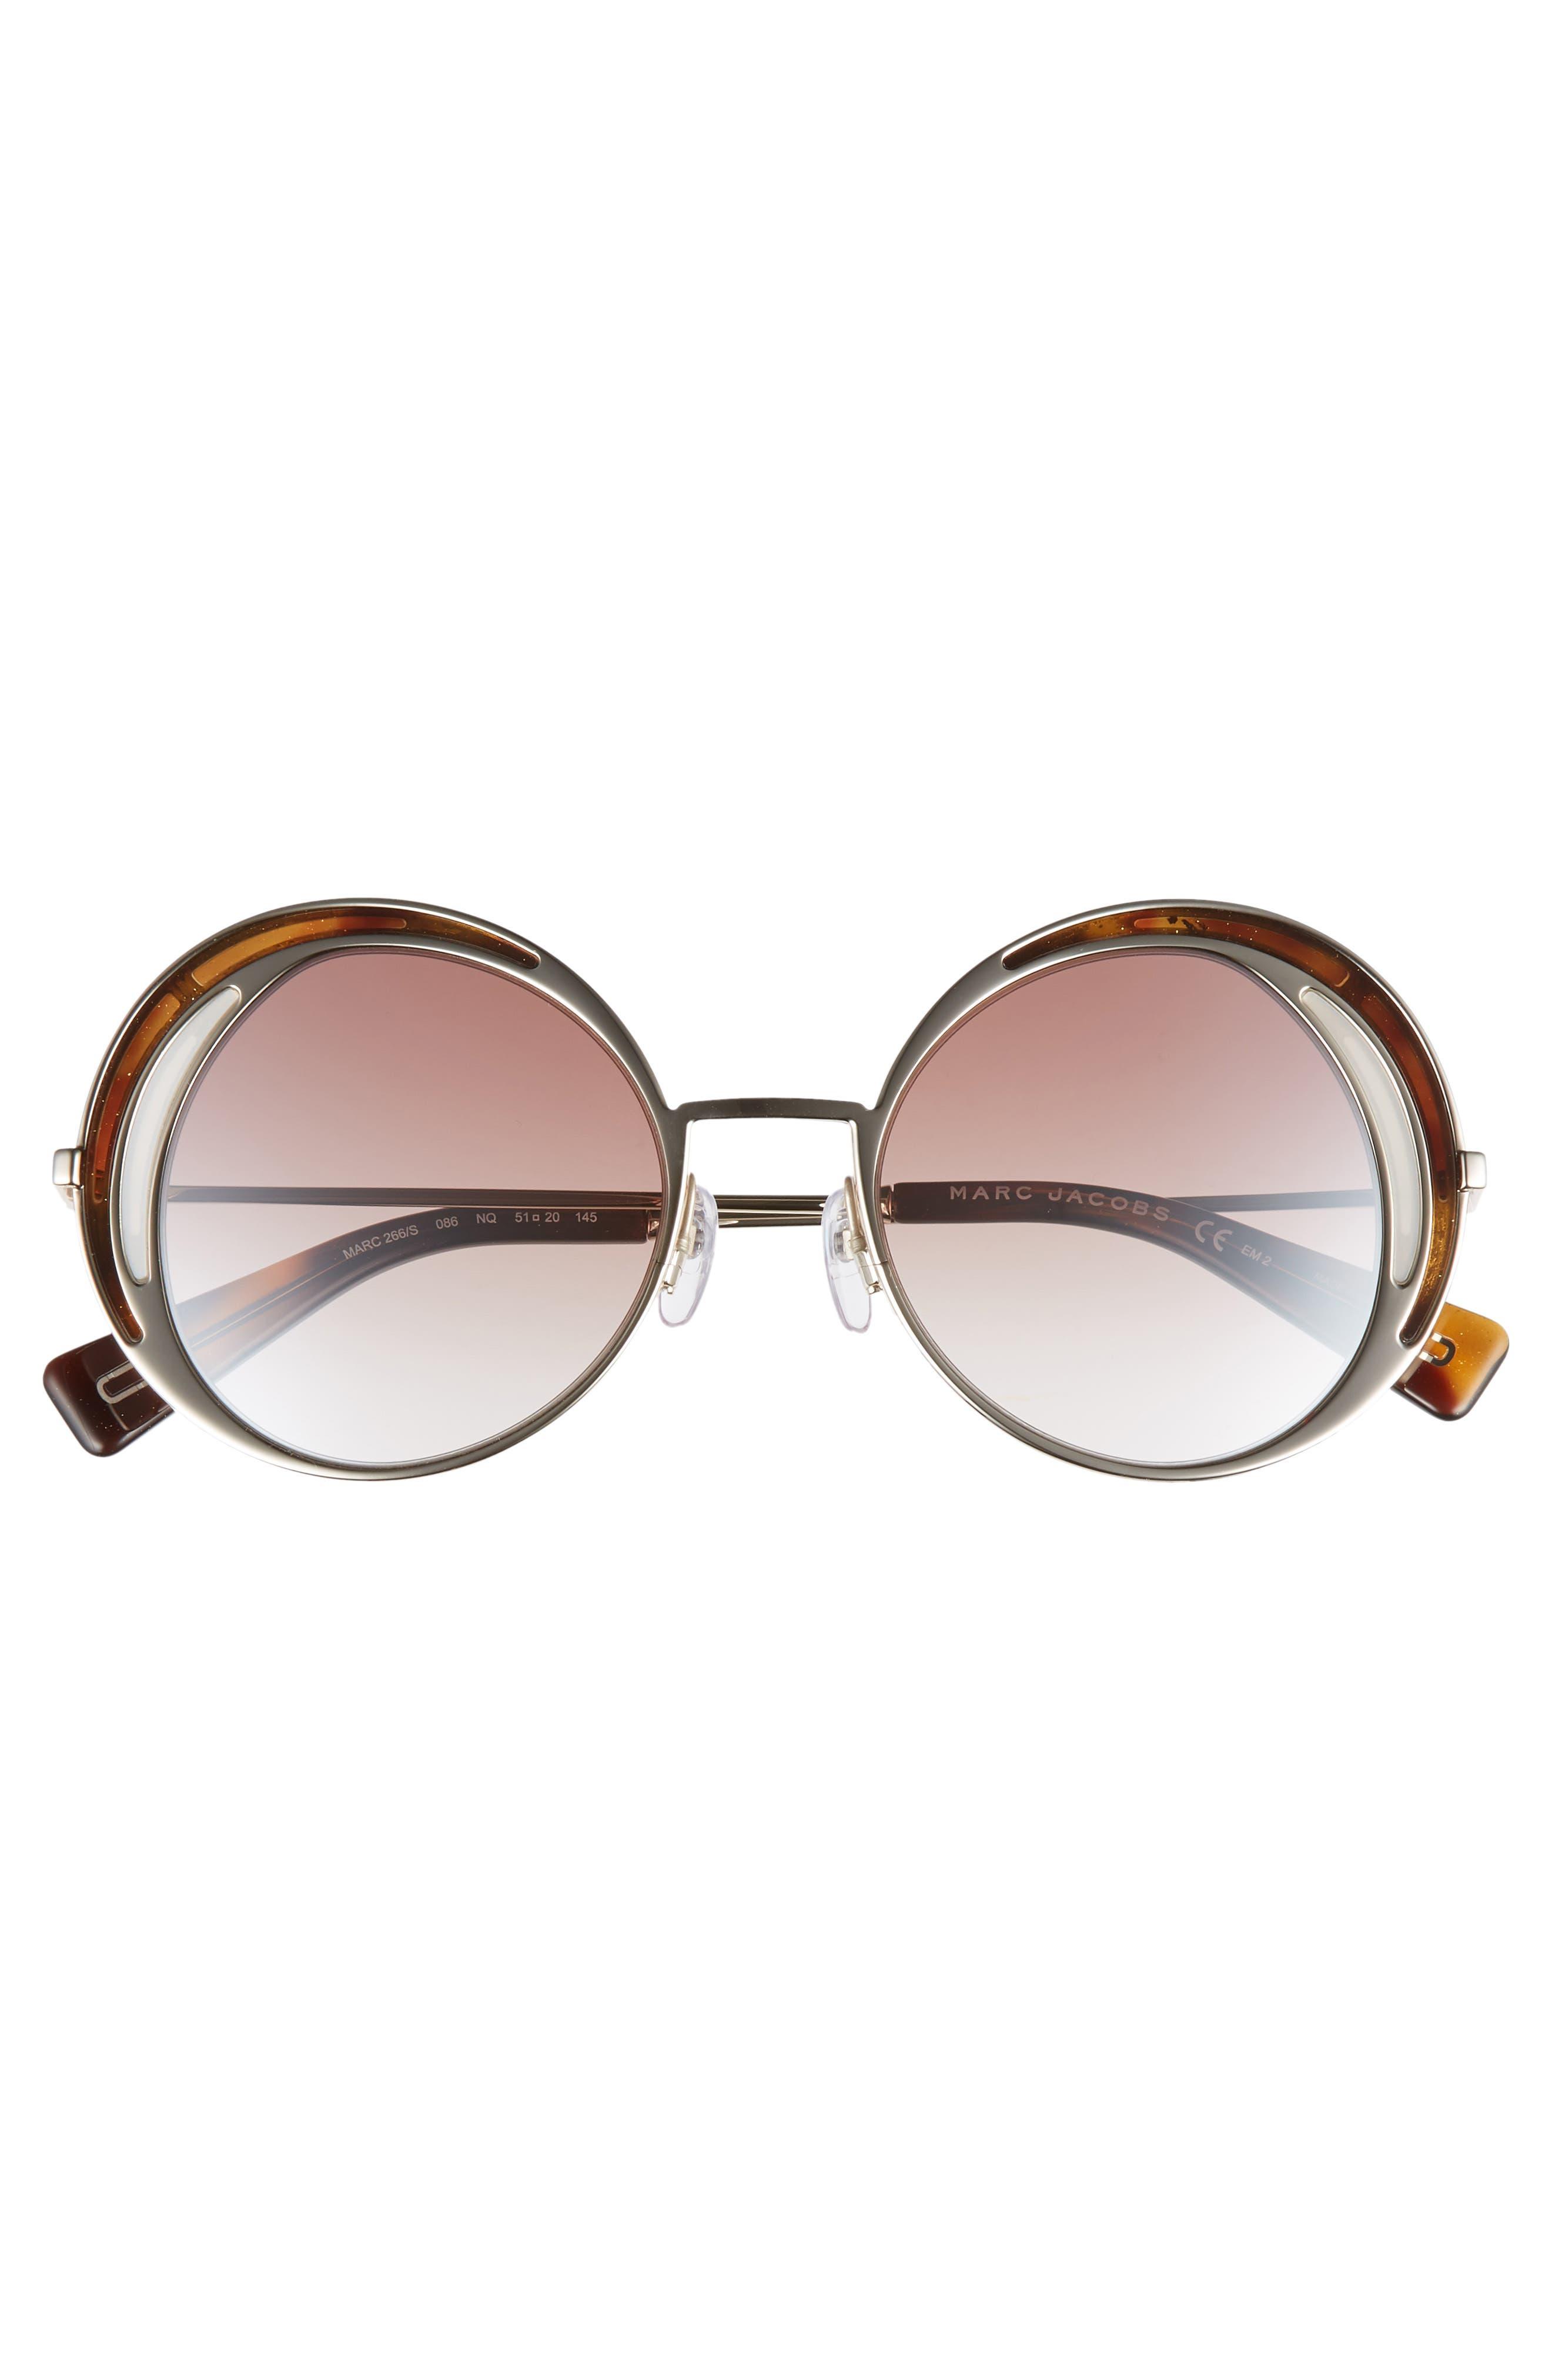 MARC JACOBS,                             51mm Round Sunglasses,                             Alternate thumbnail 3, color,                             DARK HAVANA/ GOLD